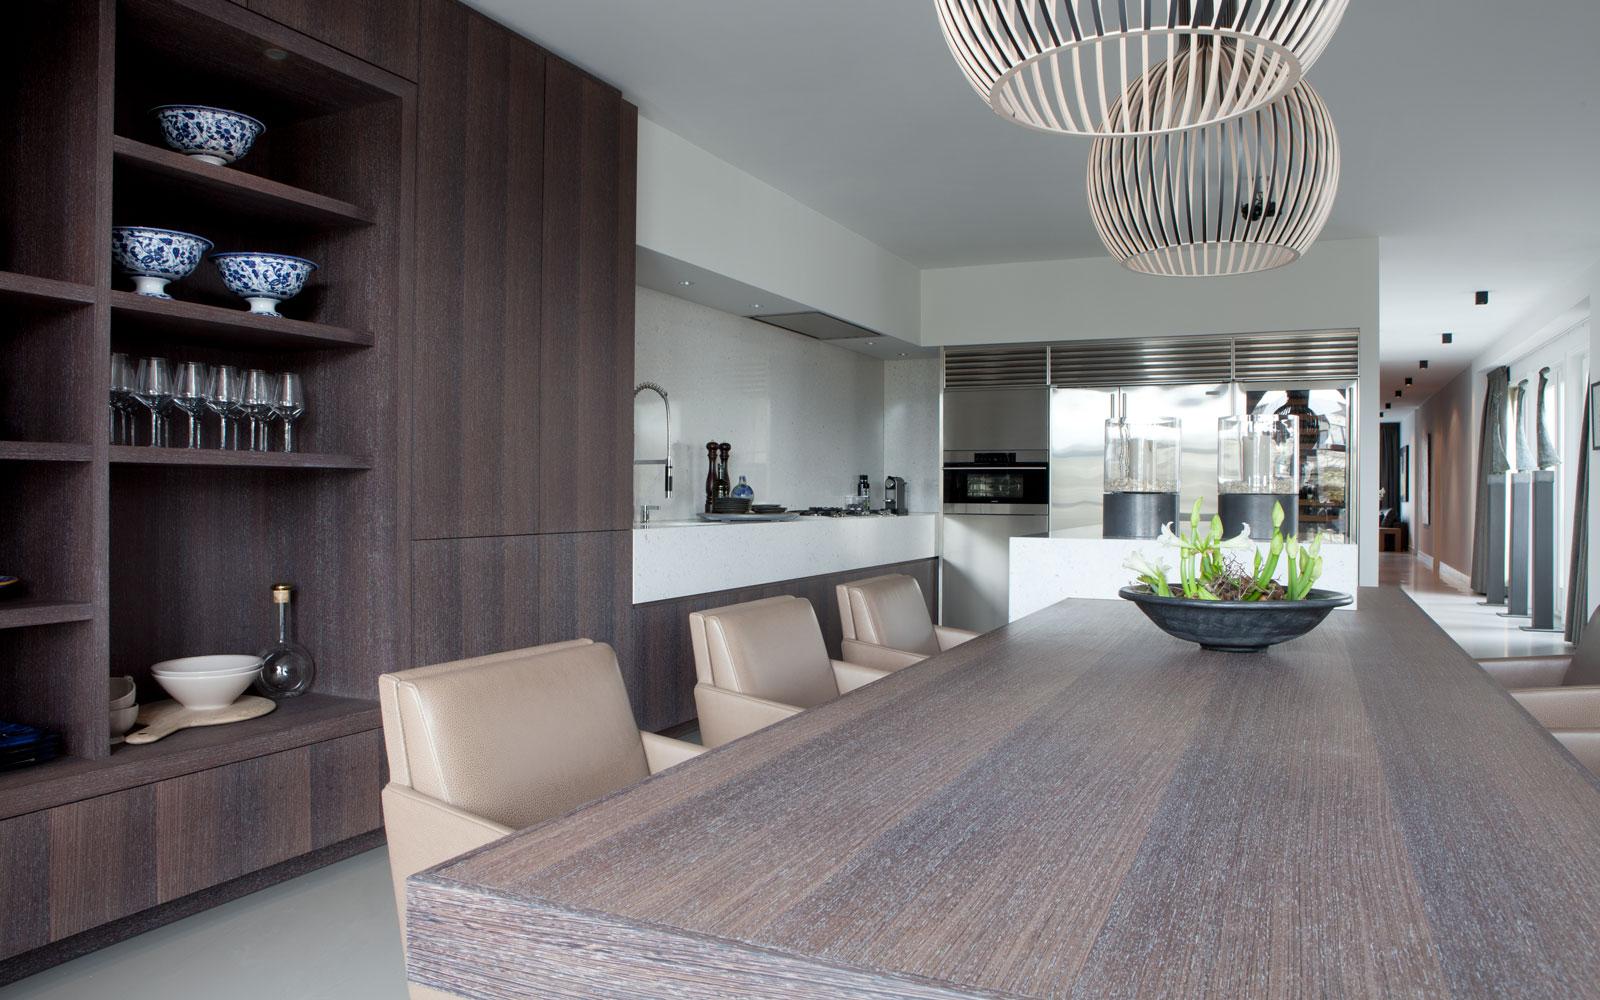 Woonkamer, keuken, maatwerk kasten, eettafel, Penthouse, Amsterdam, Remy Meijers